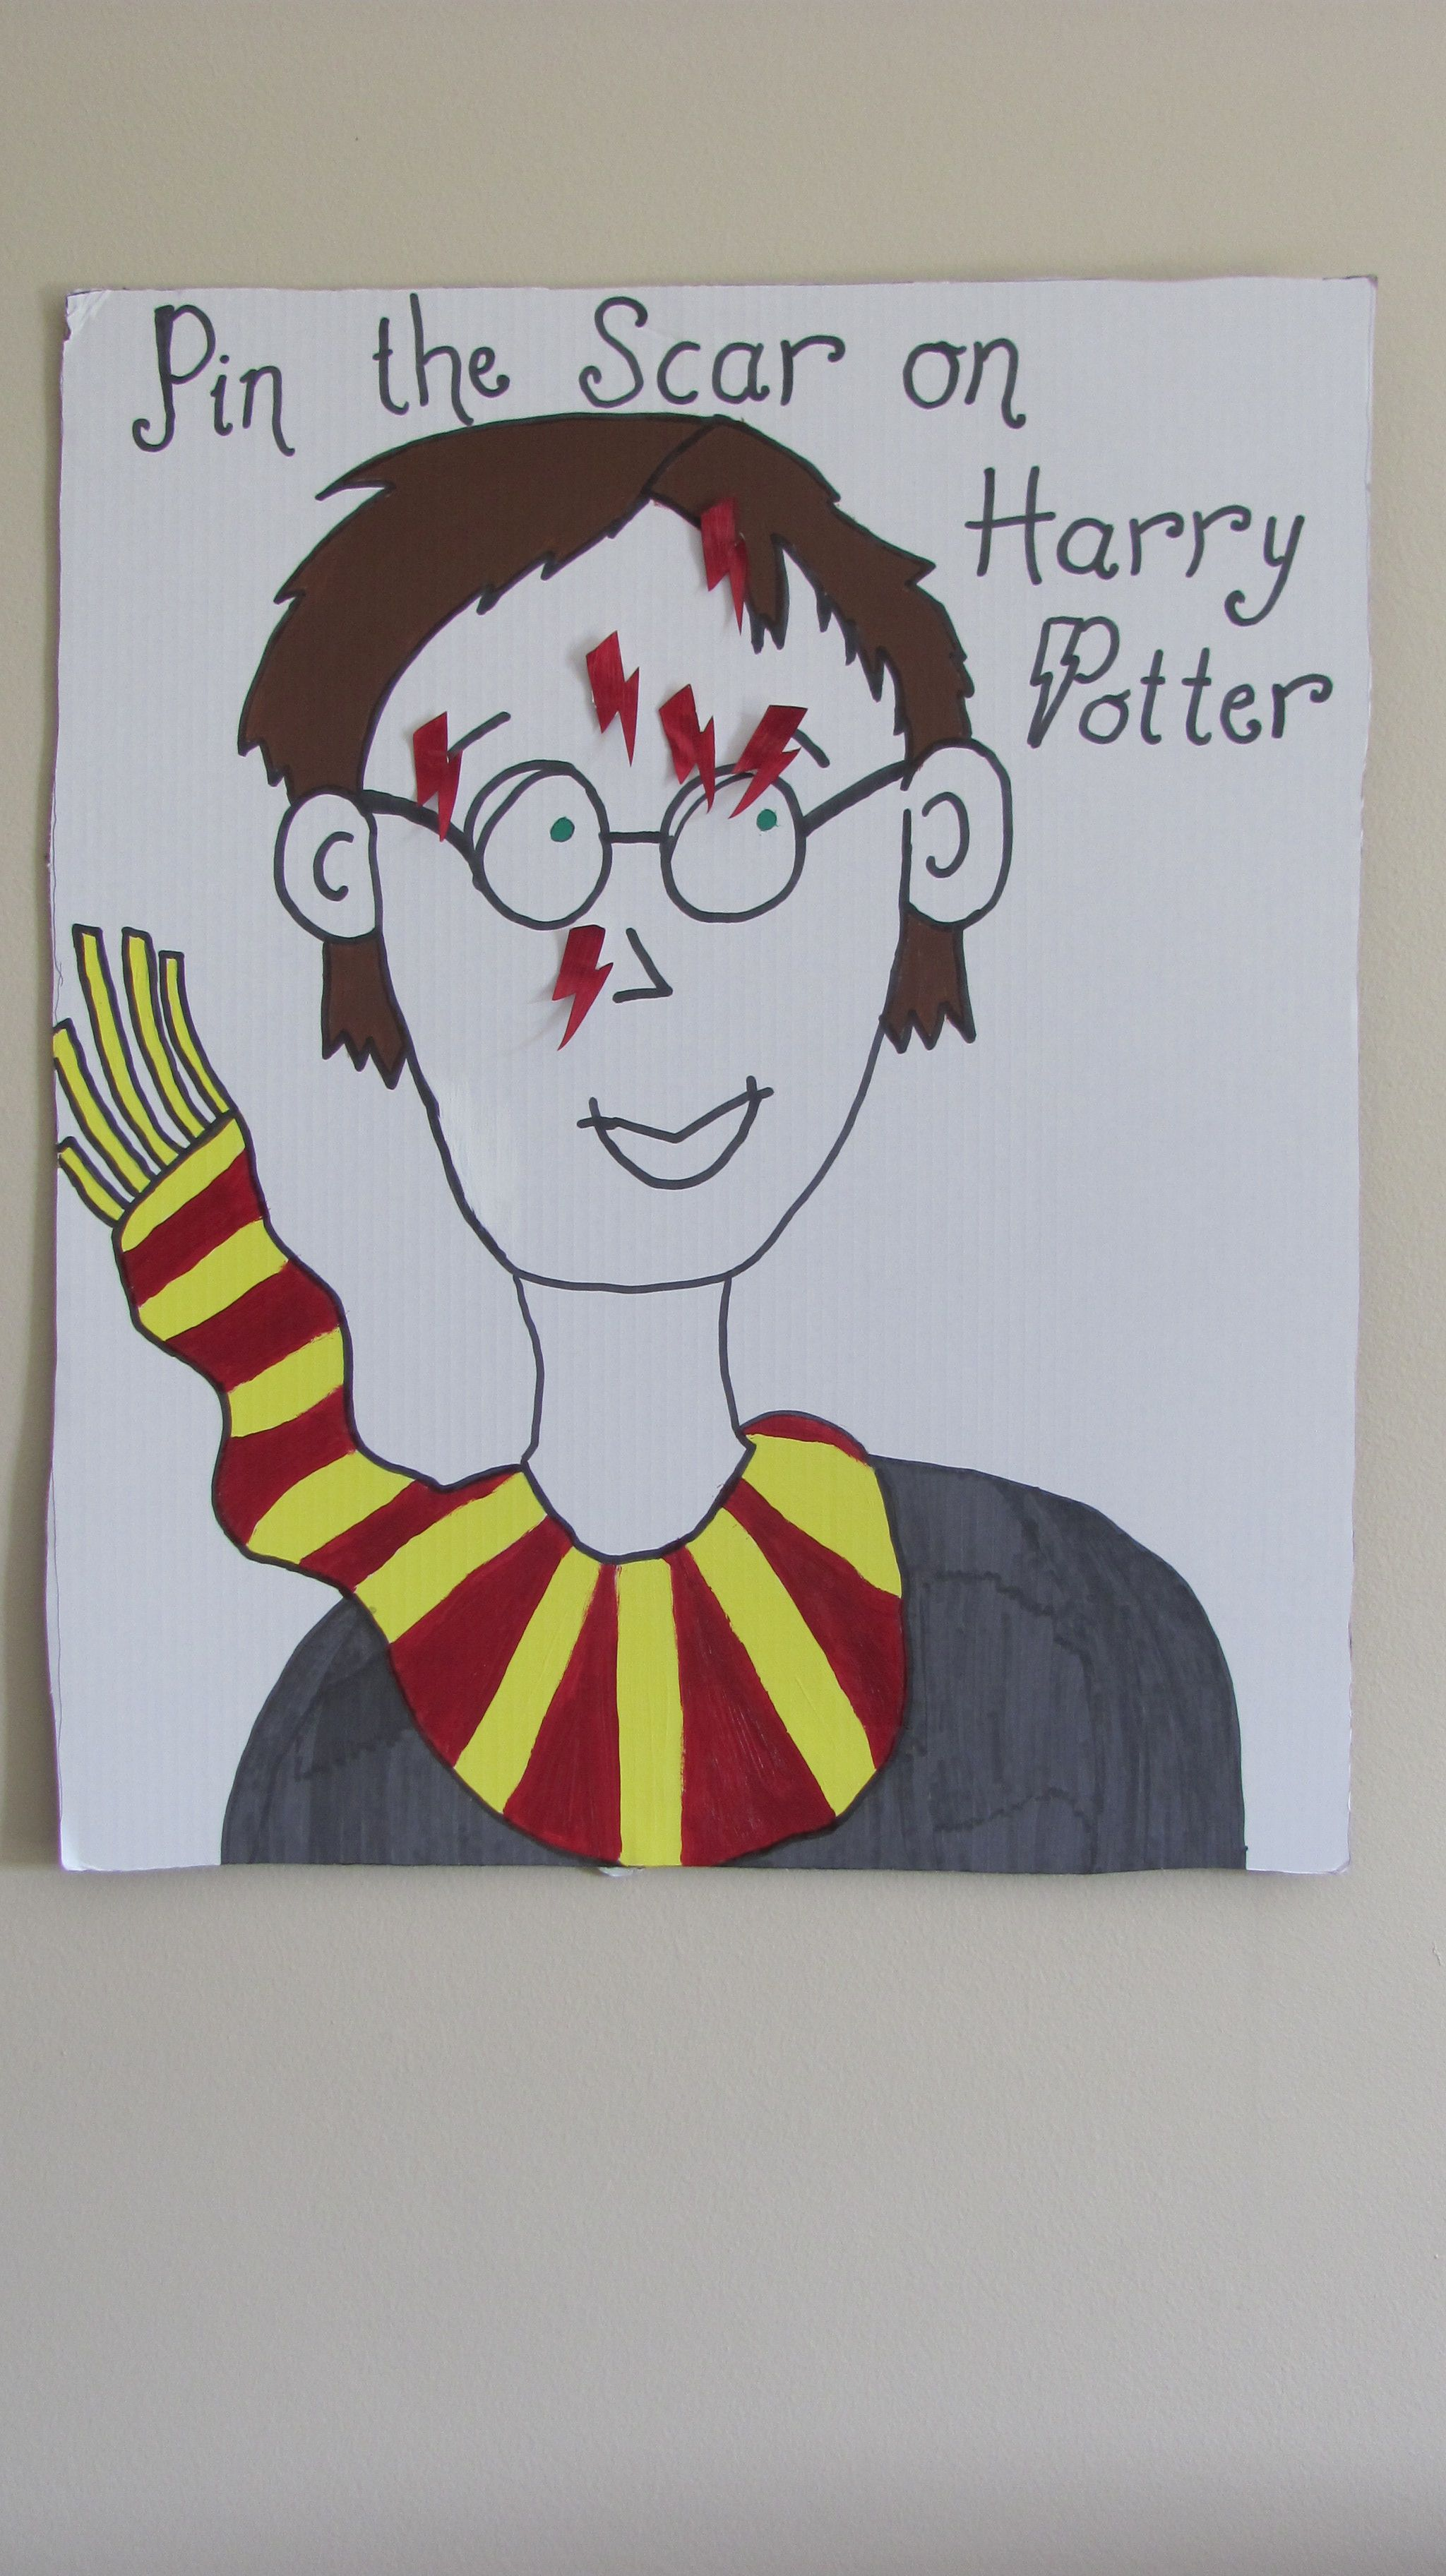 Artesanato Com Papel Origami Passo A Passo ~ Festa Harry Potter DIY Artesanato Pinterest Festa harry potter, Harry potter e Festa